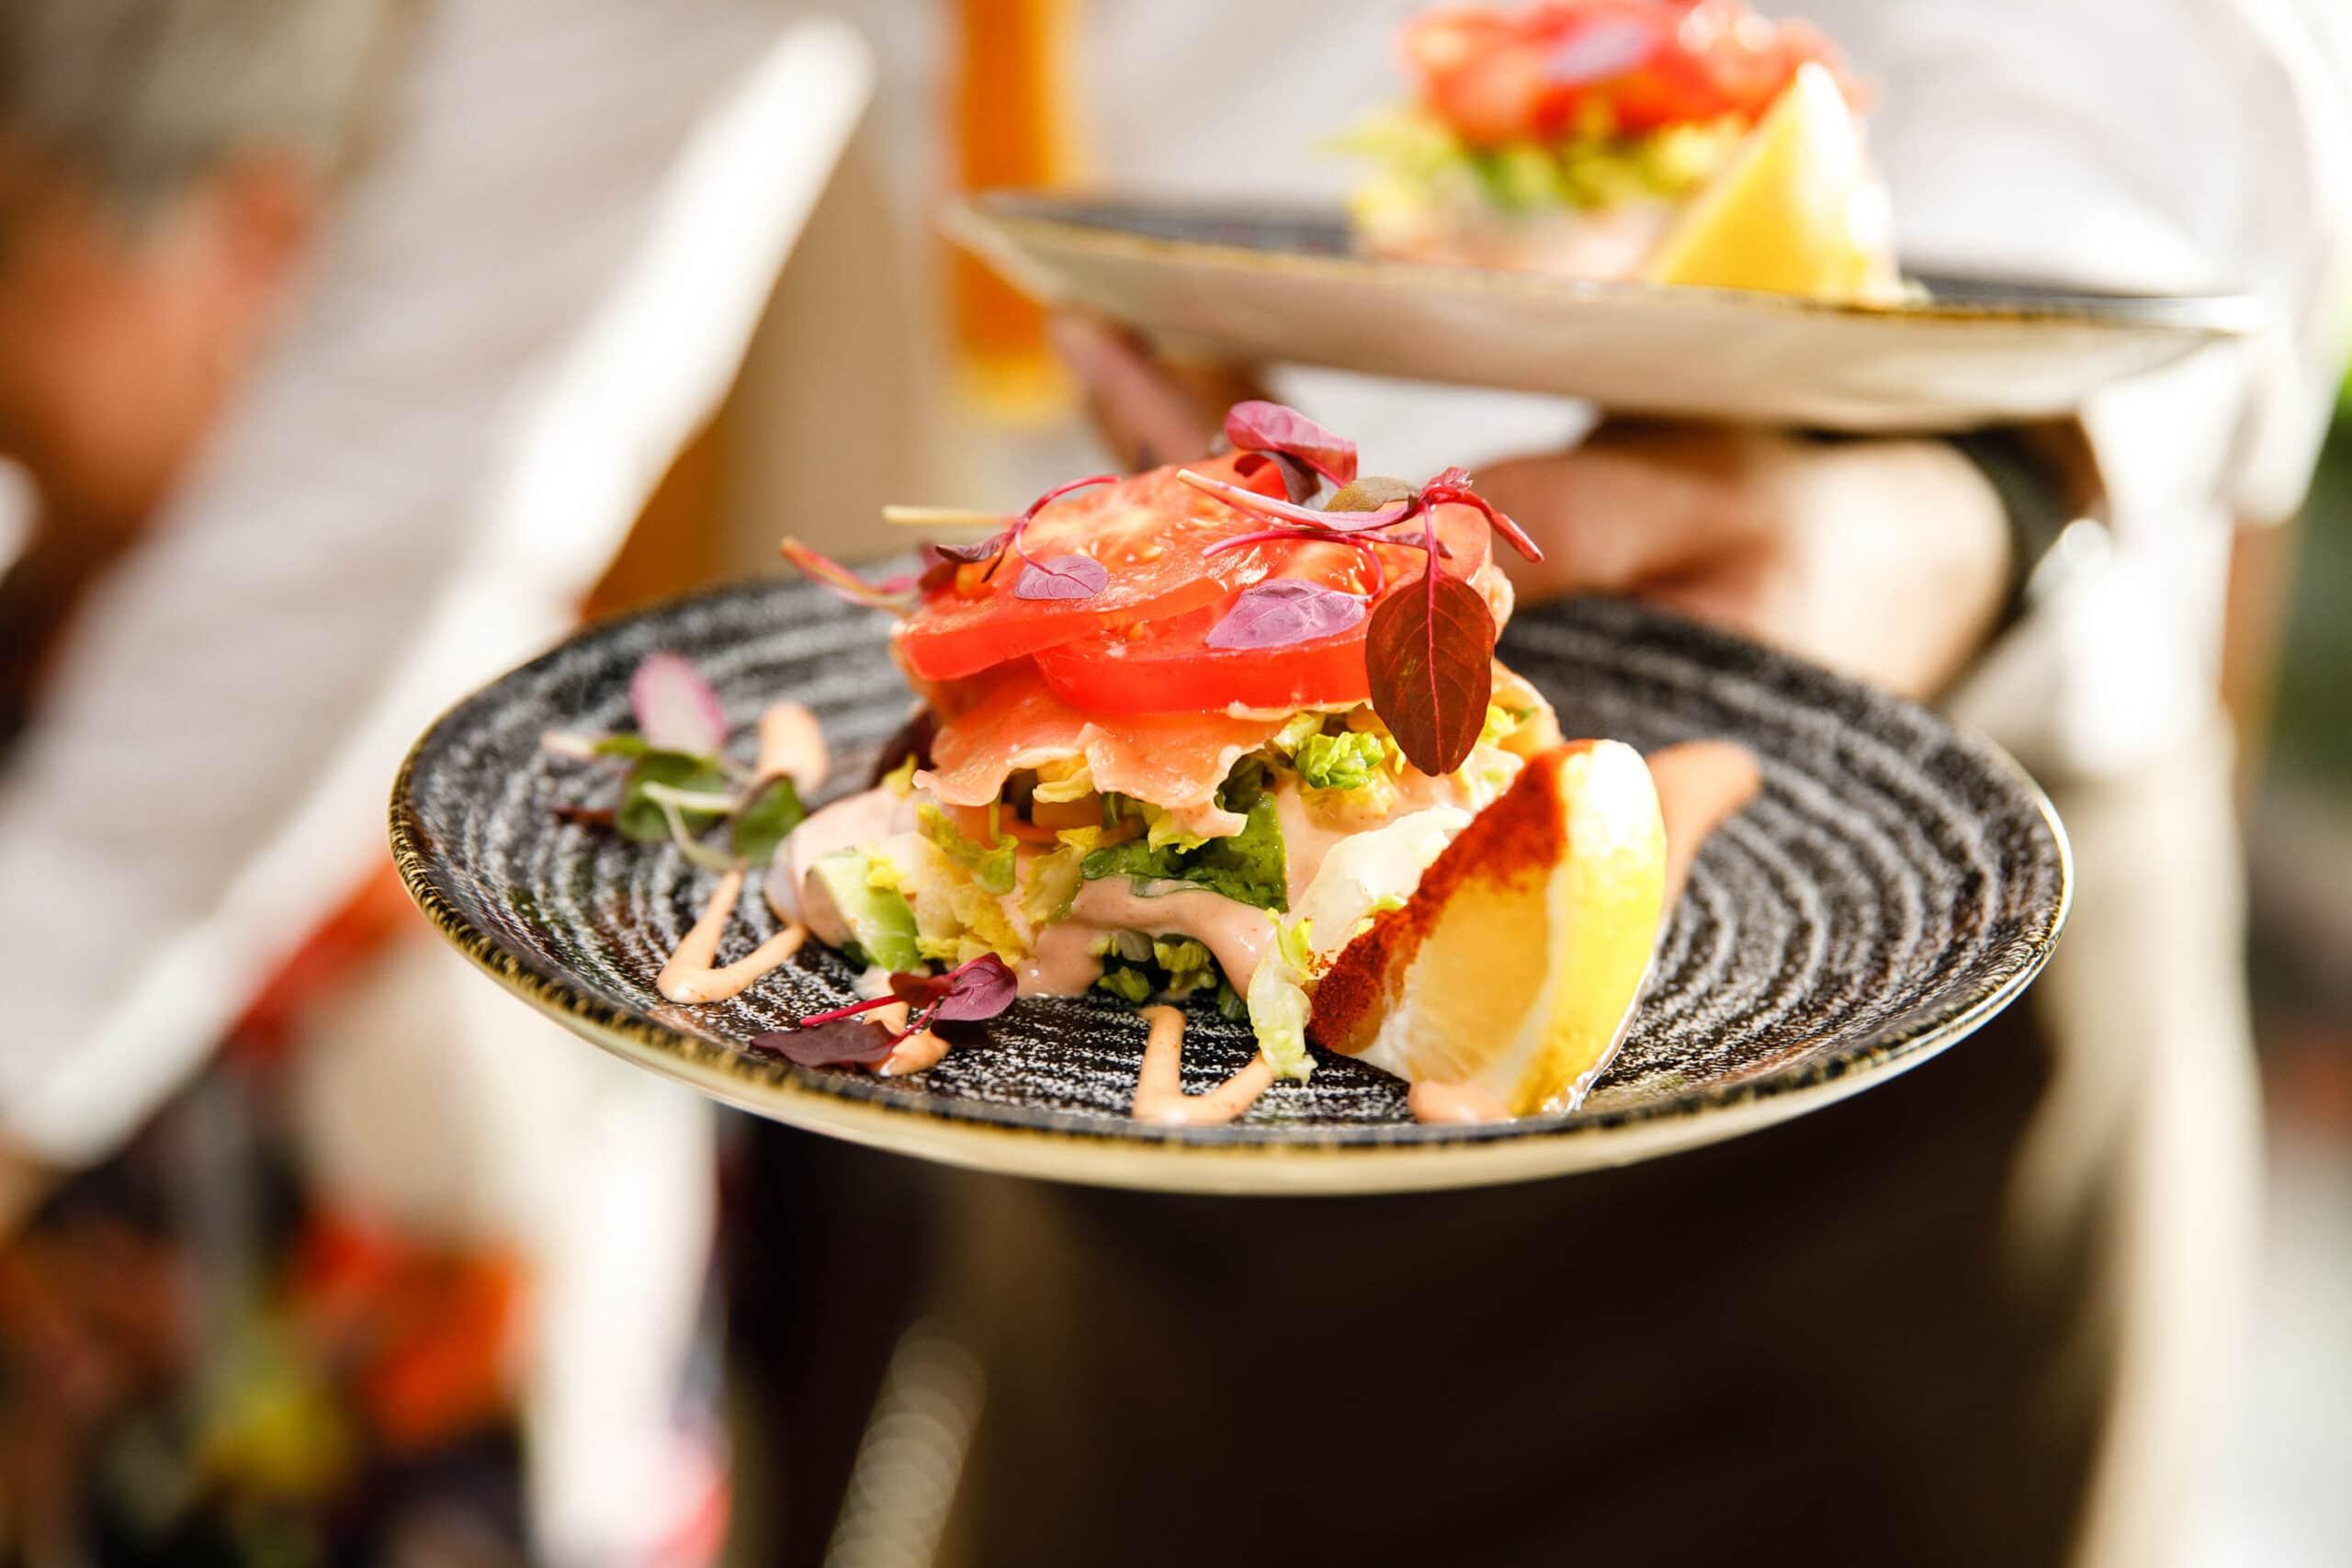 stunning summer dish photo taken by food photographer